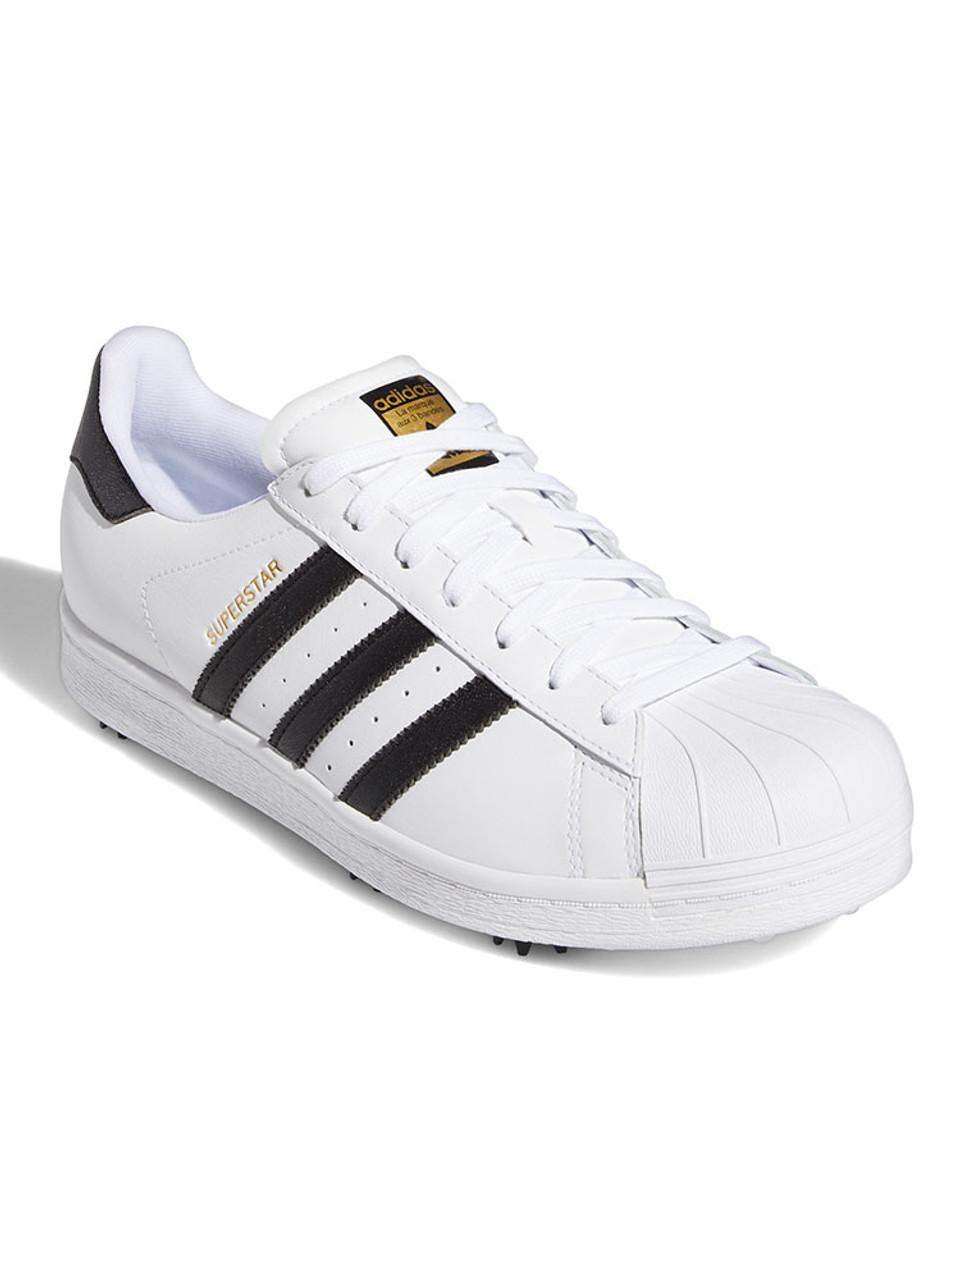 all white classic adidas